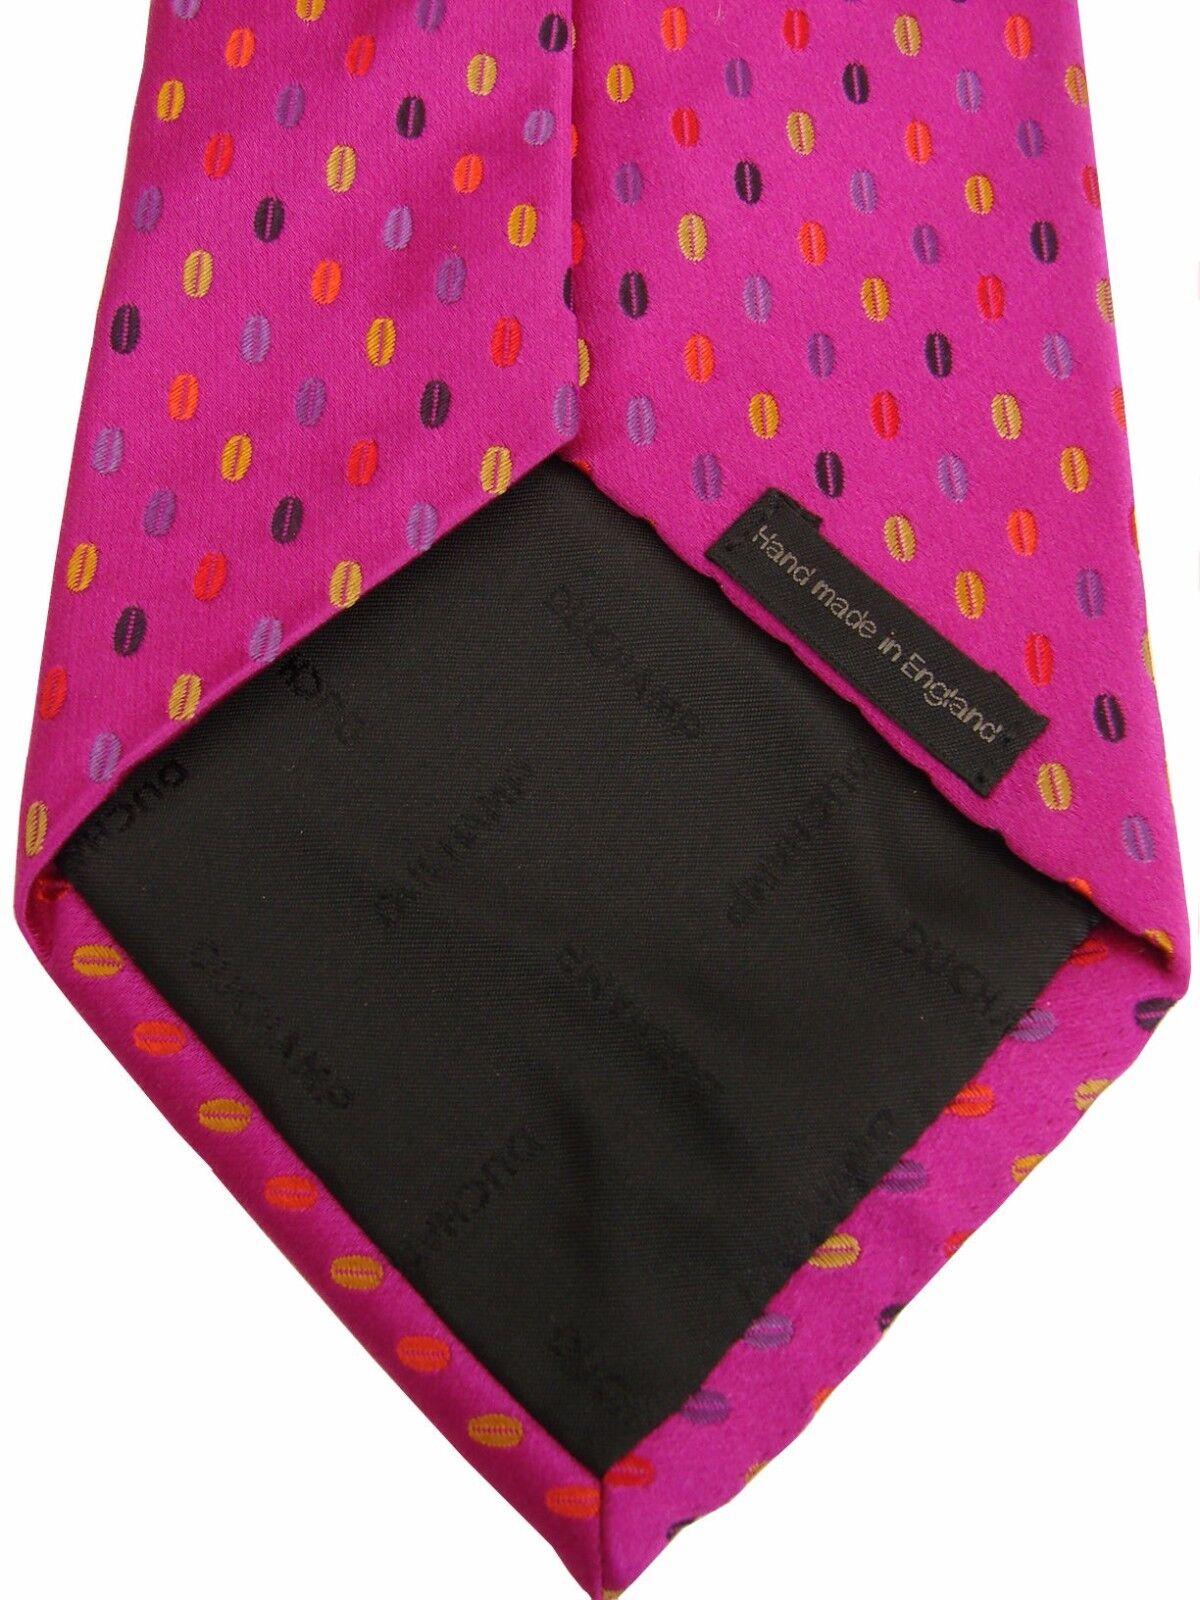 DUCHAMP LONDON LONDON LONDON Tie Fuchsia - Multi-Colourot Ovals | Perfekte Verarbeitung  372d84